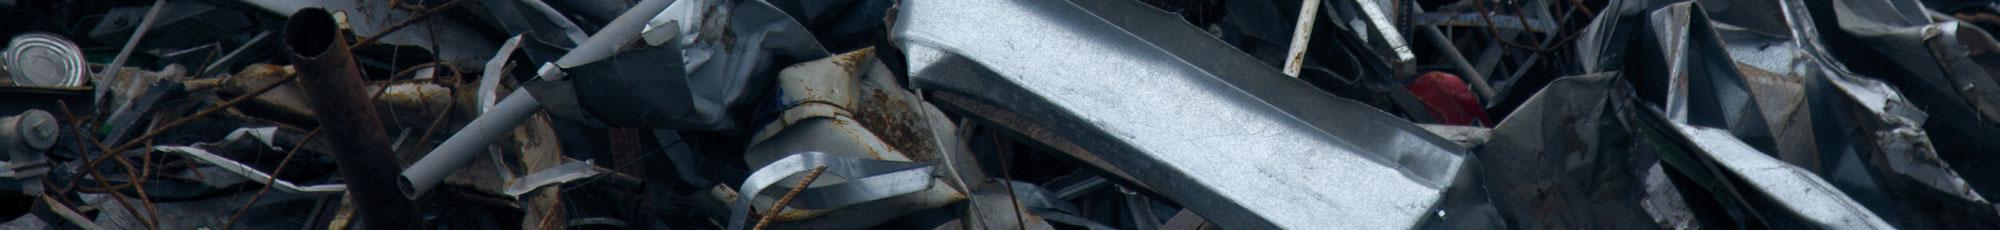 abfall-schrott-metall-container-entsorgen